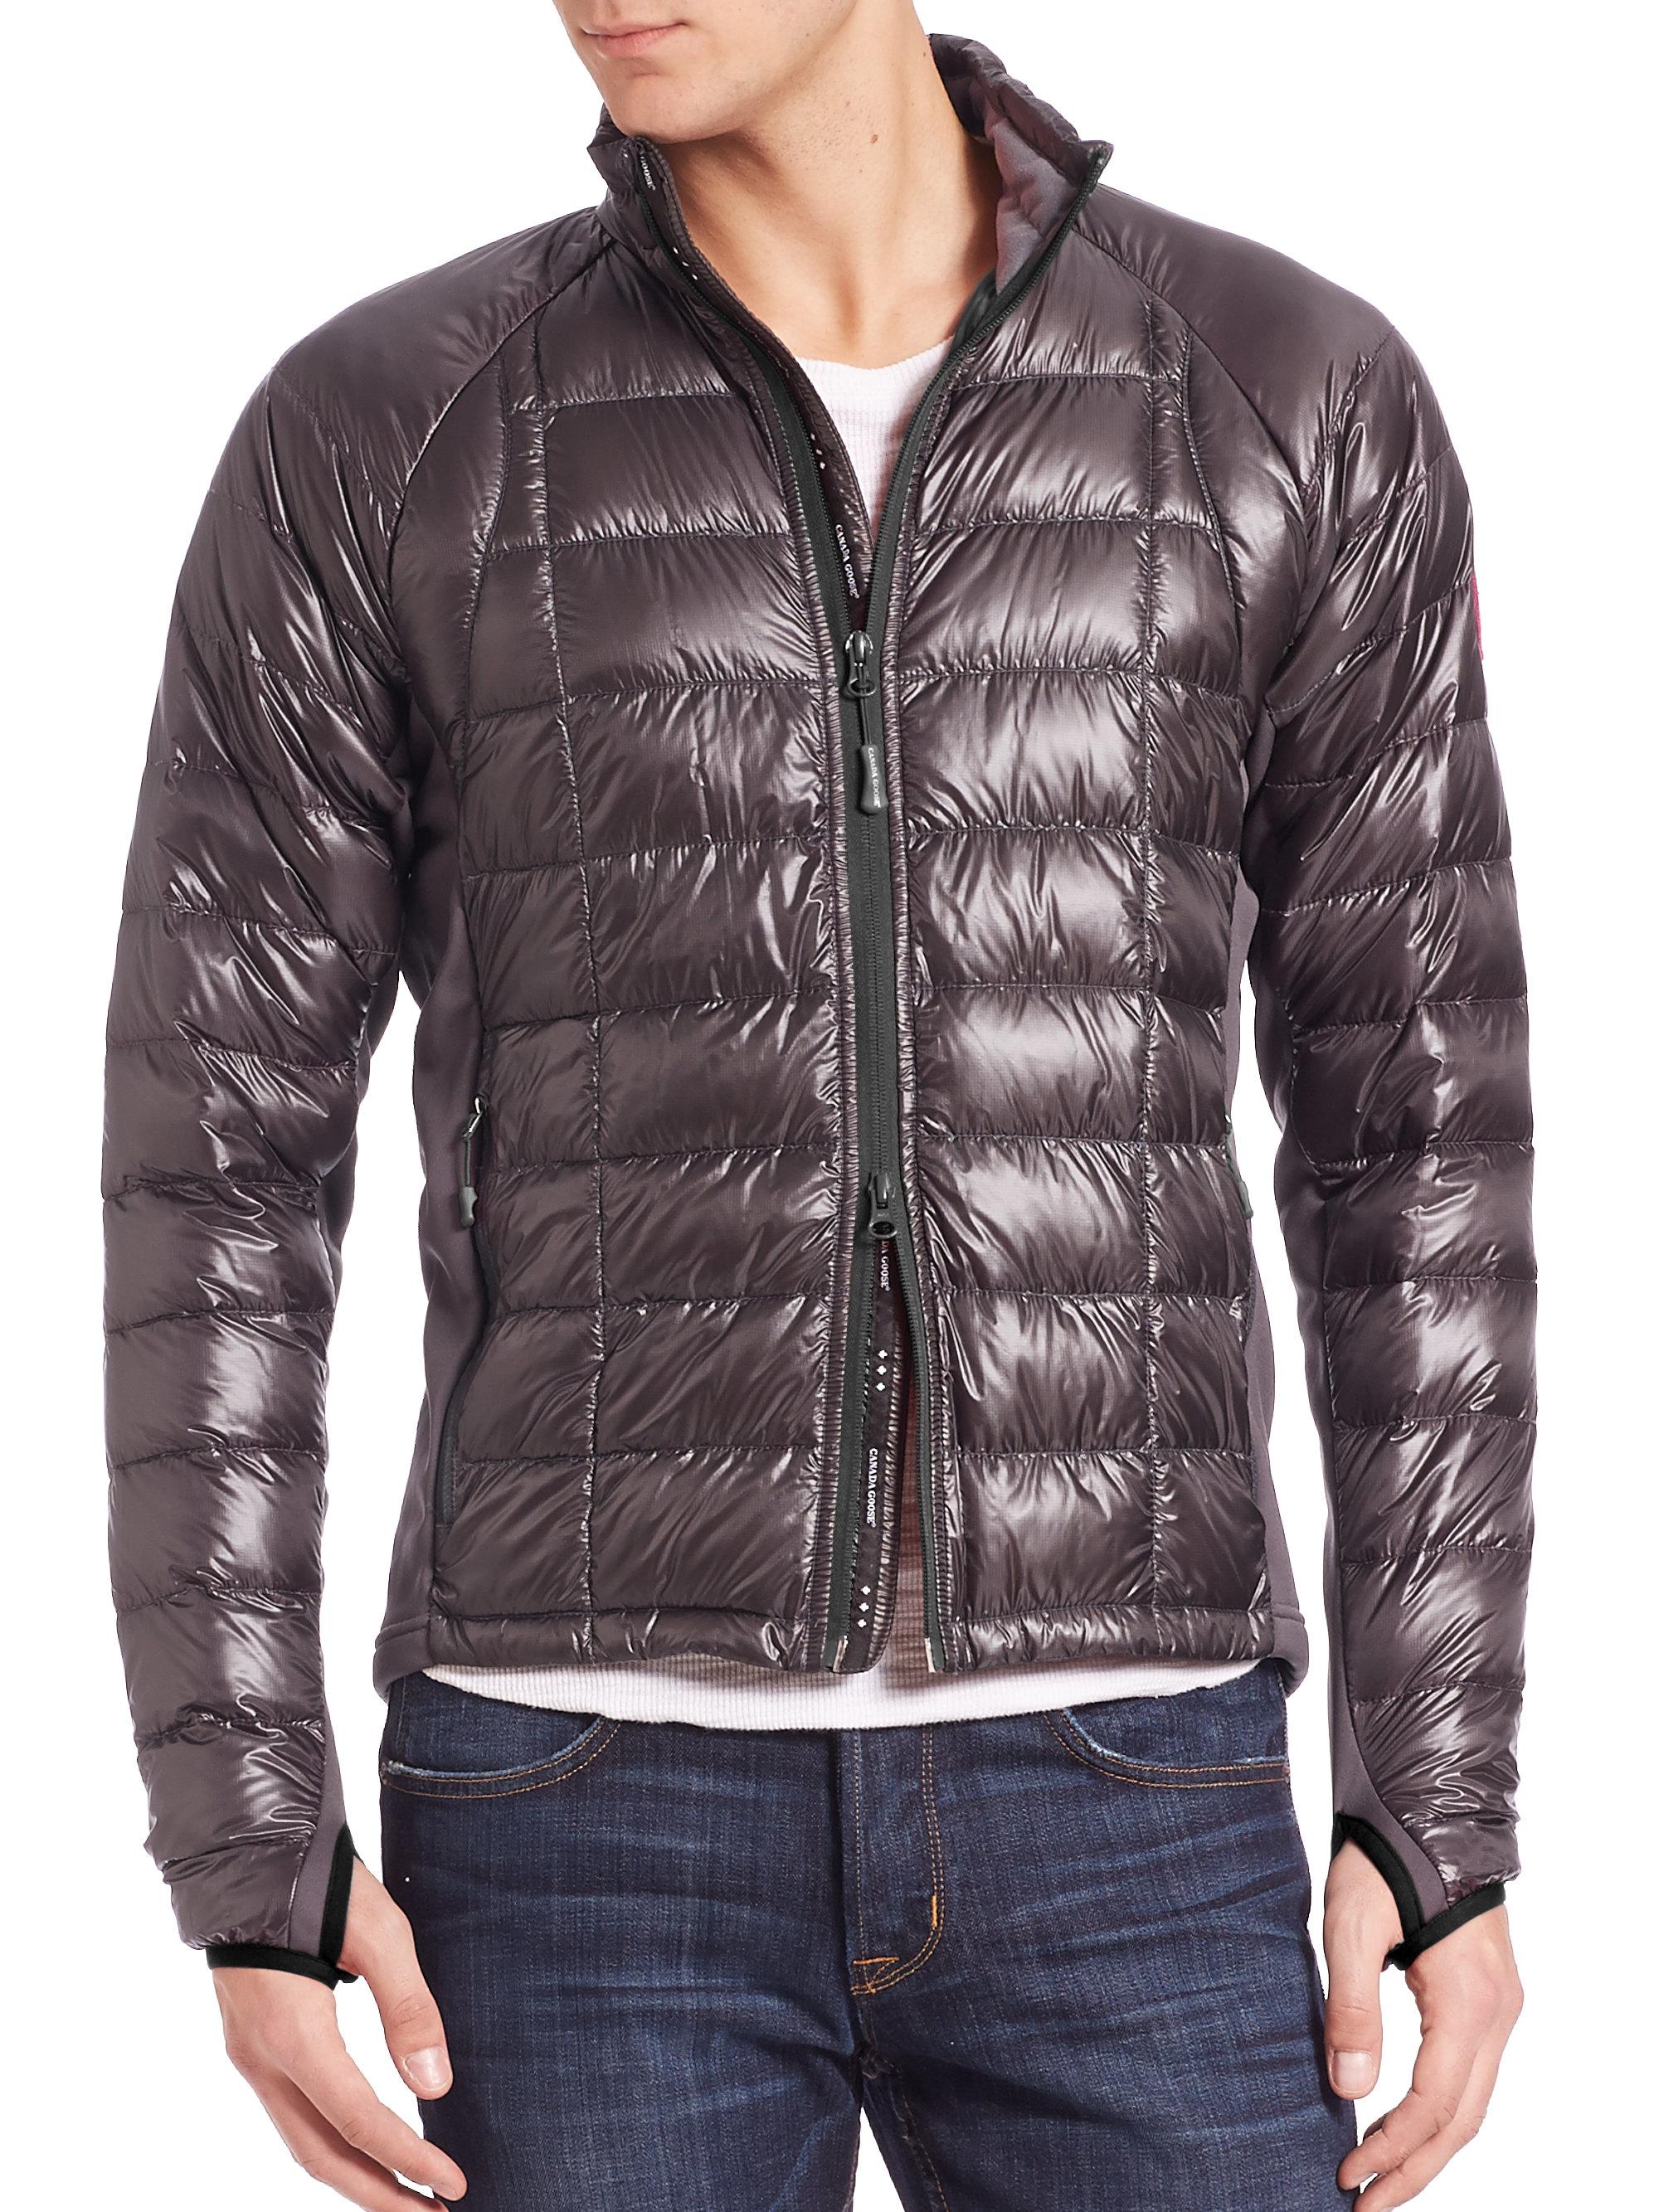 Canada Goose chilliwack parka online discounts - Canada goose Hybridge Lite Jacket in Gray for Men (graphite) | Lyst